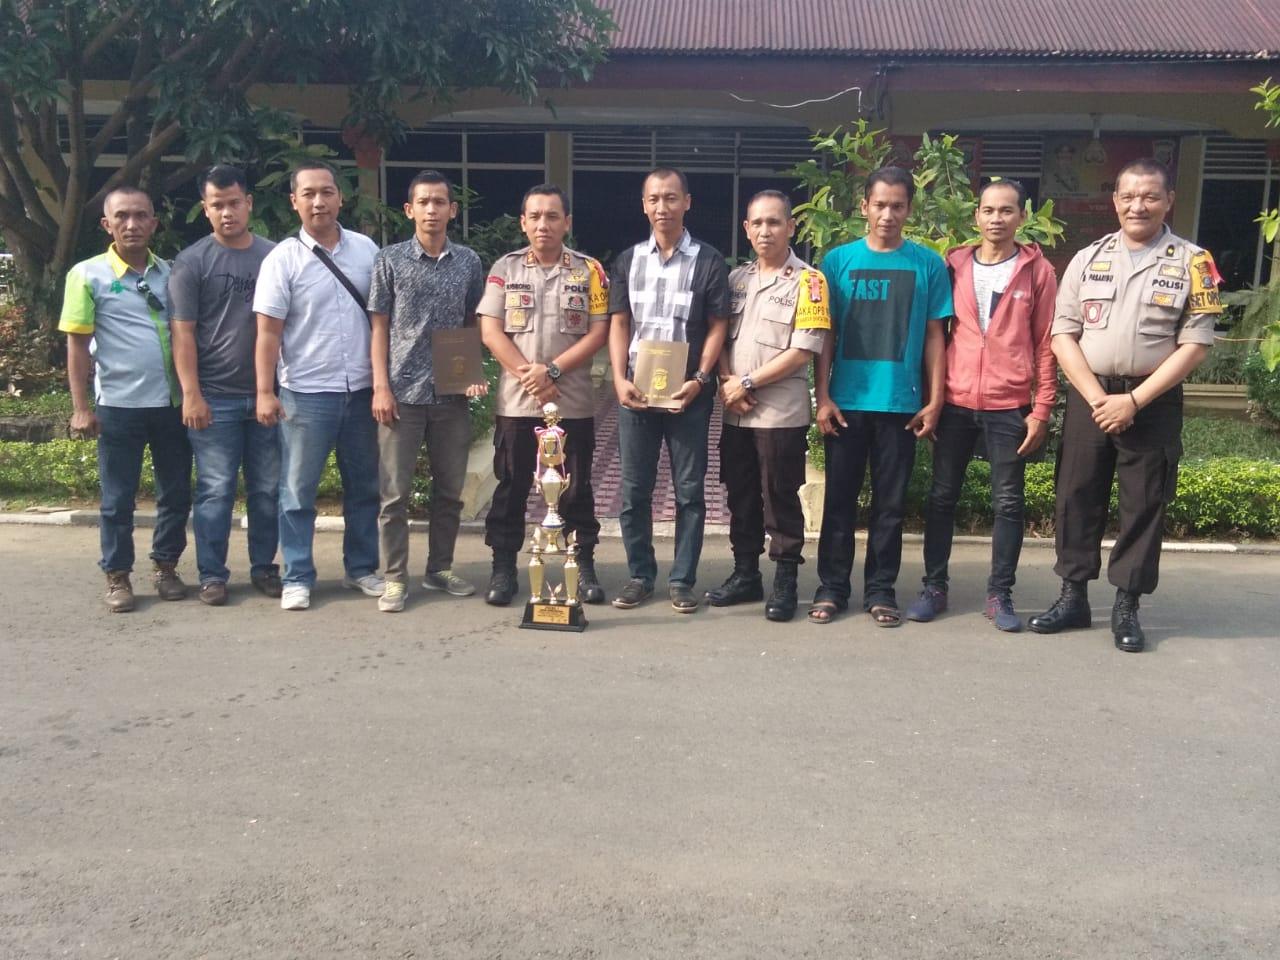 Kapolres Binjai AKBP Nugroho Tri Nuryanto berikan penghargaan kepada para pemain Futsal Wartawan Pokja Polres Binjai.